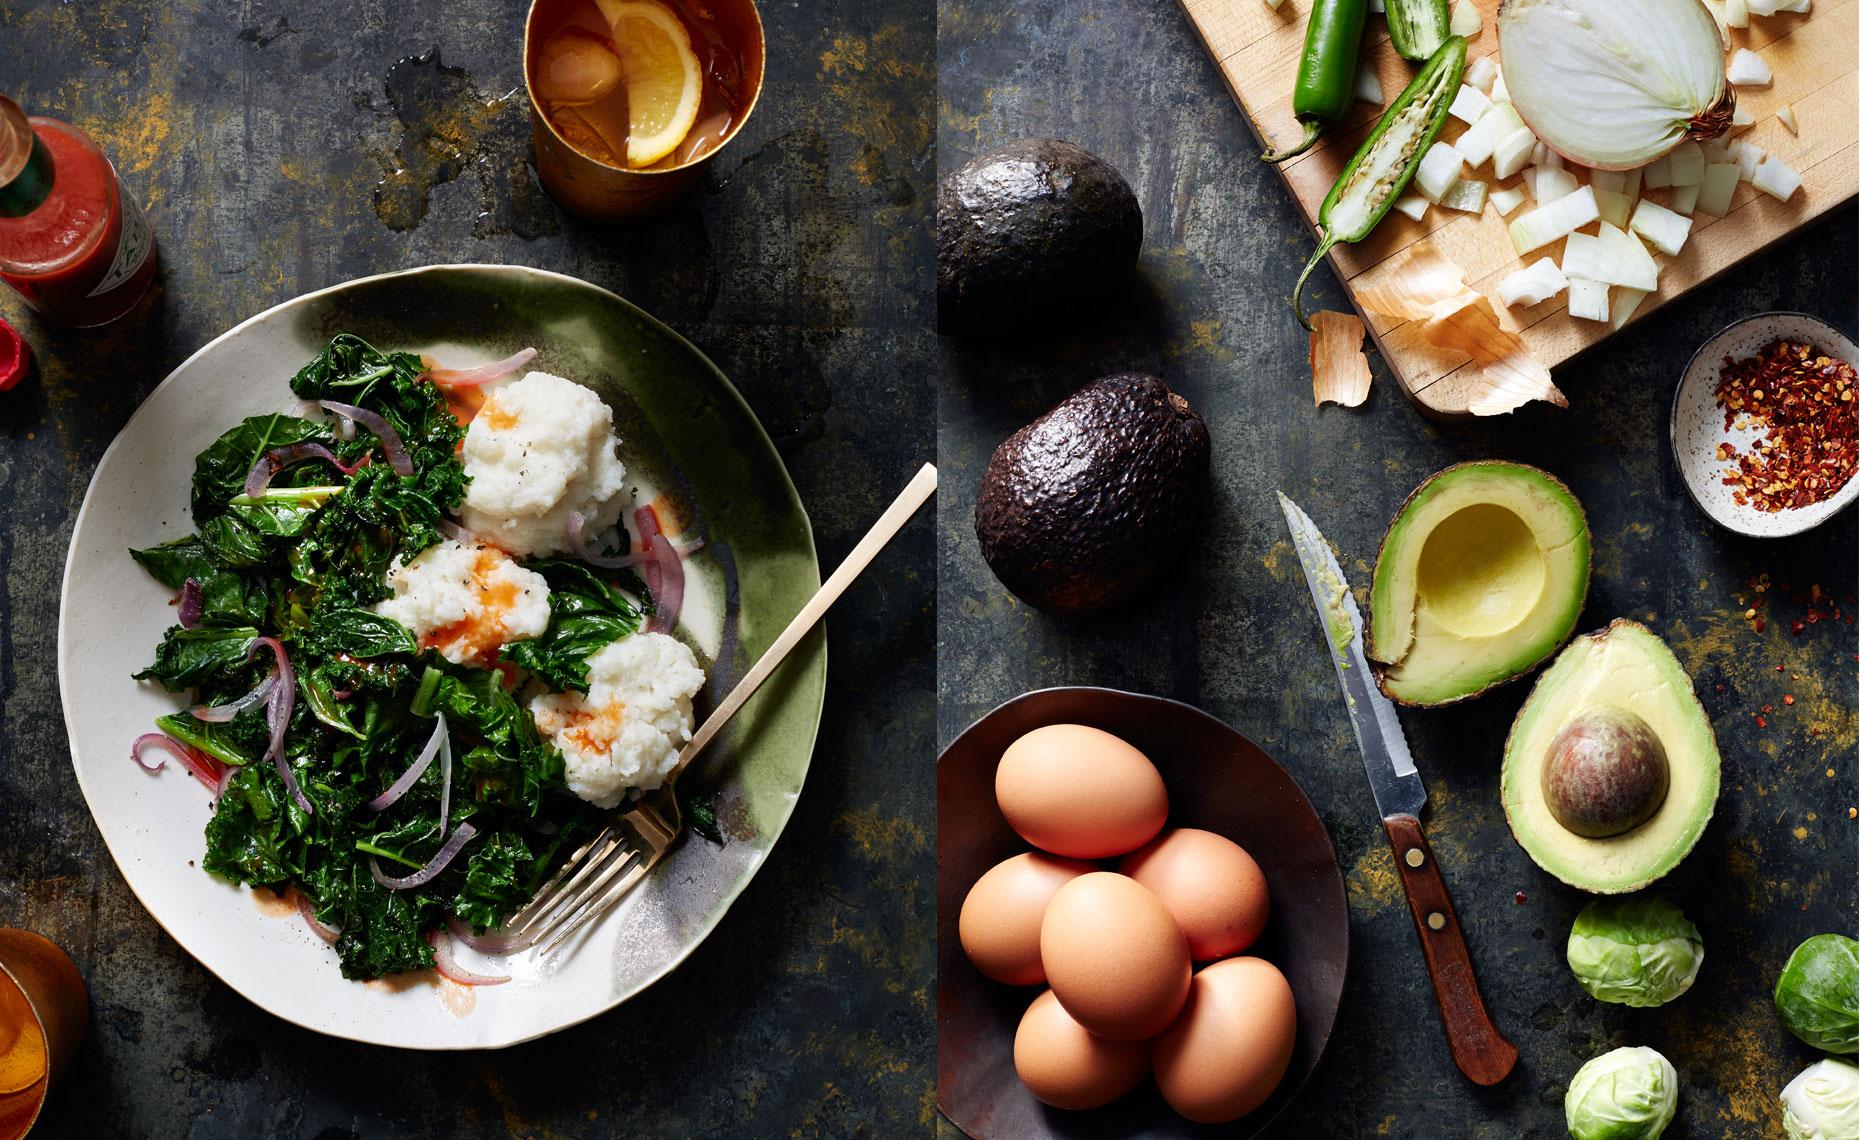 spinach-and-avocado.jpg